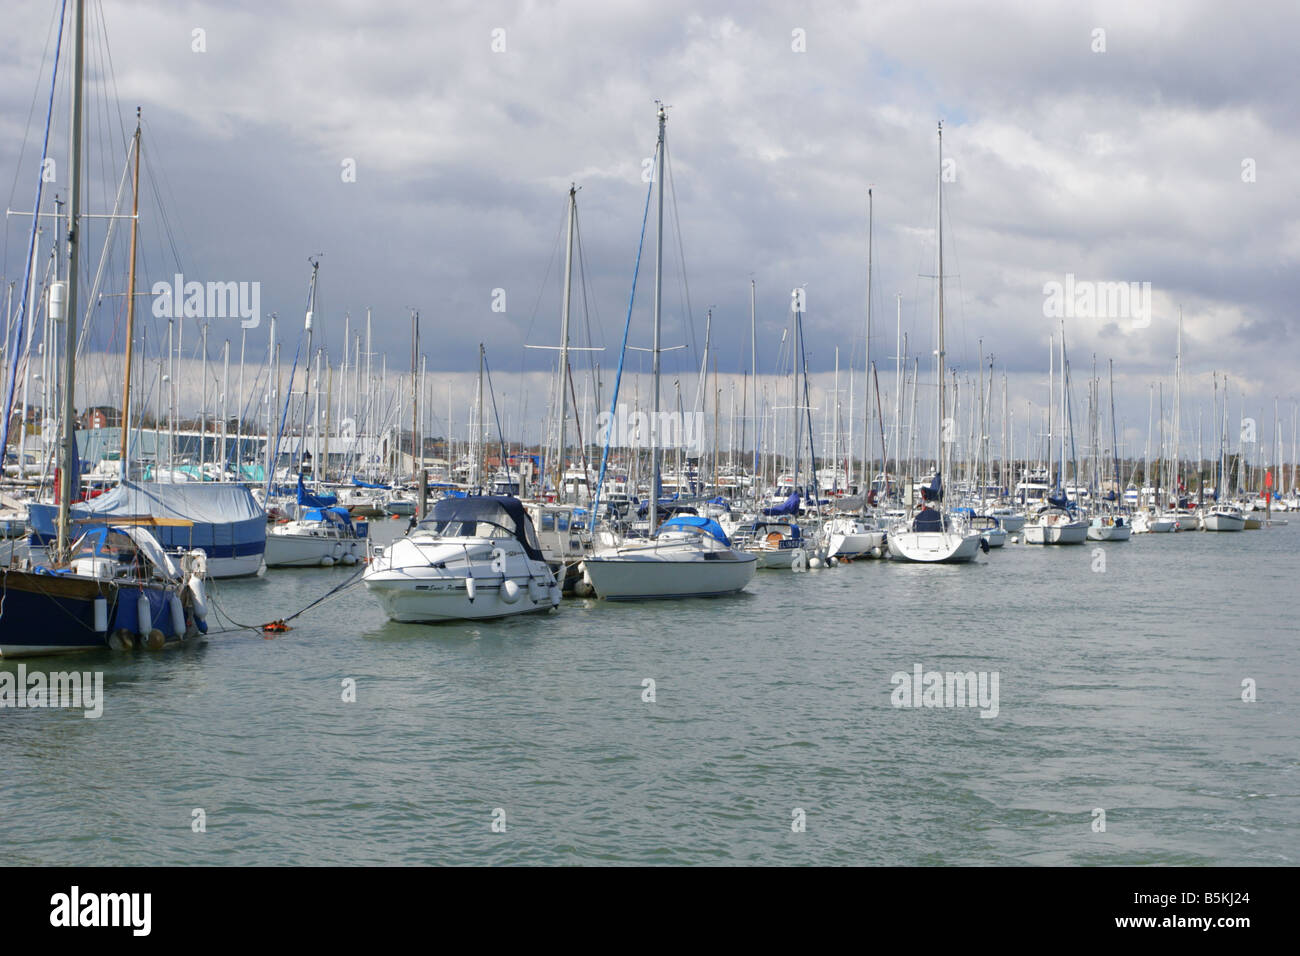 Yachts in Lymington Marina Taken April Lymington Hampshire UK - Stock Image